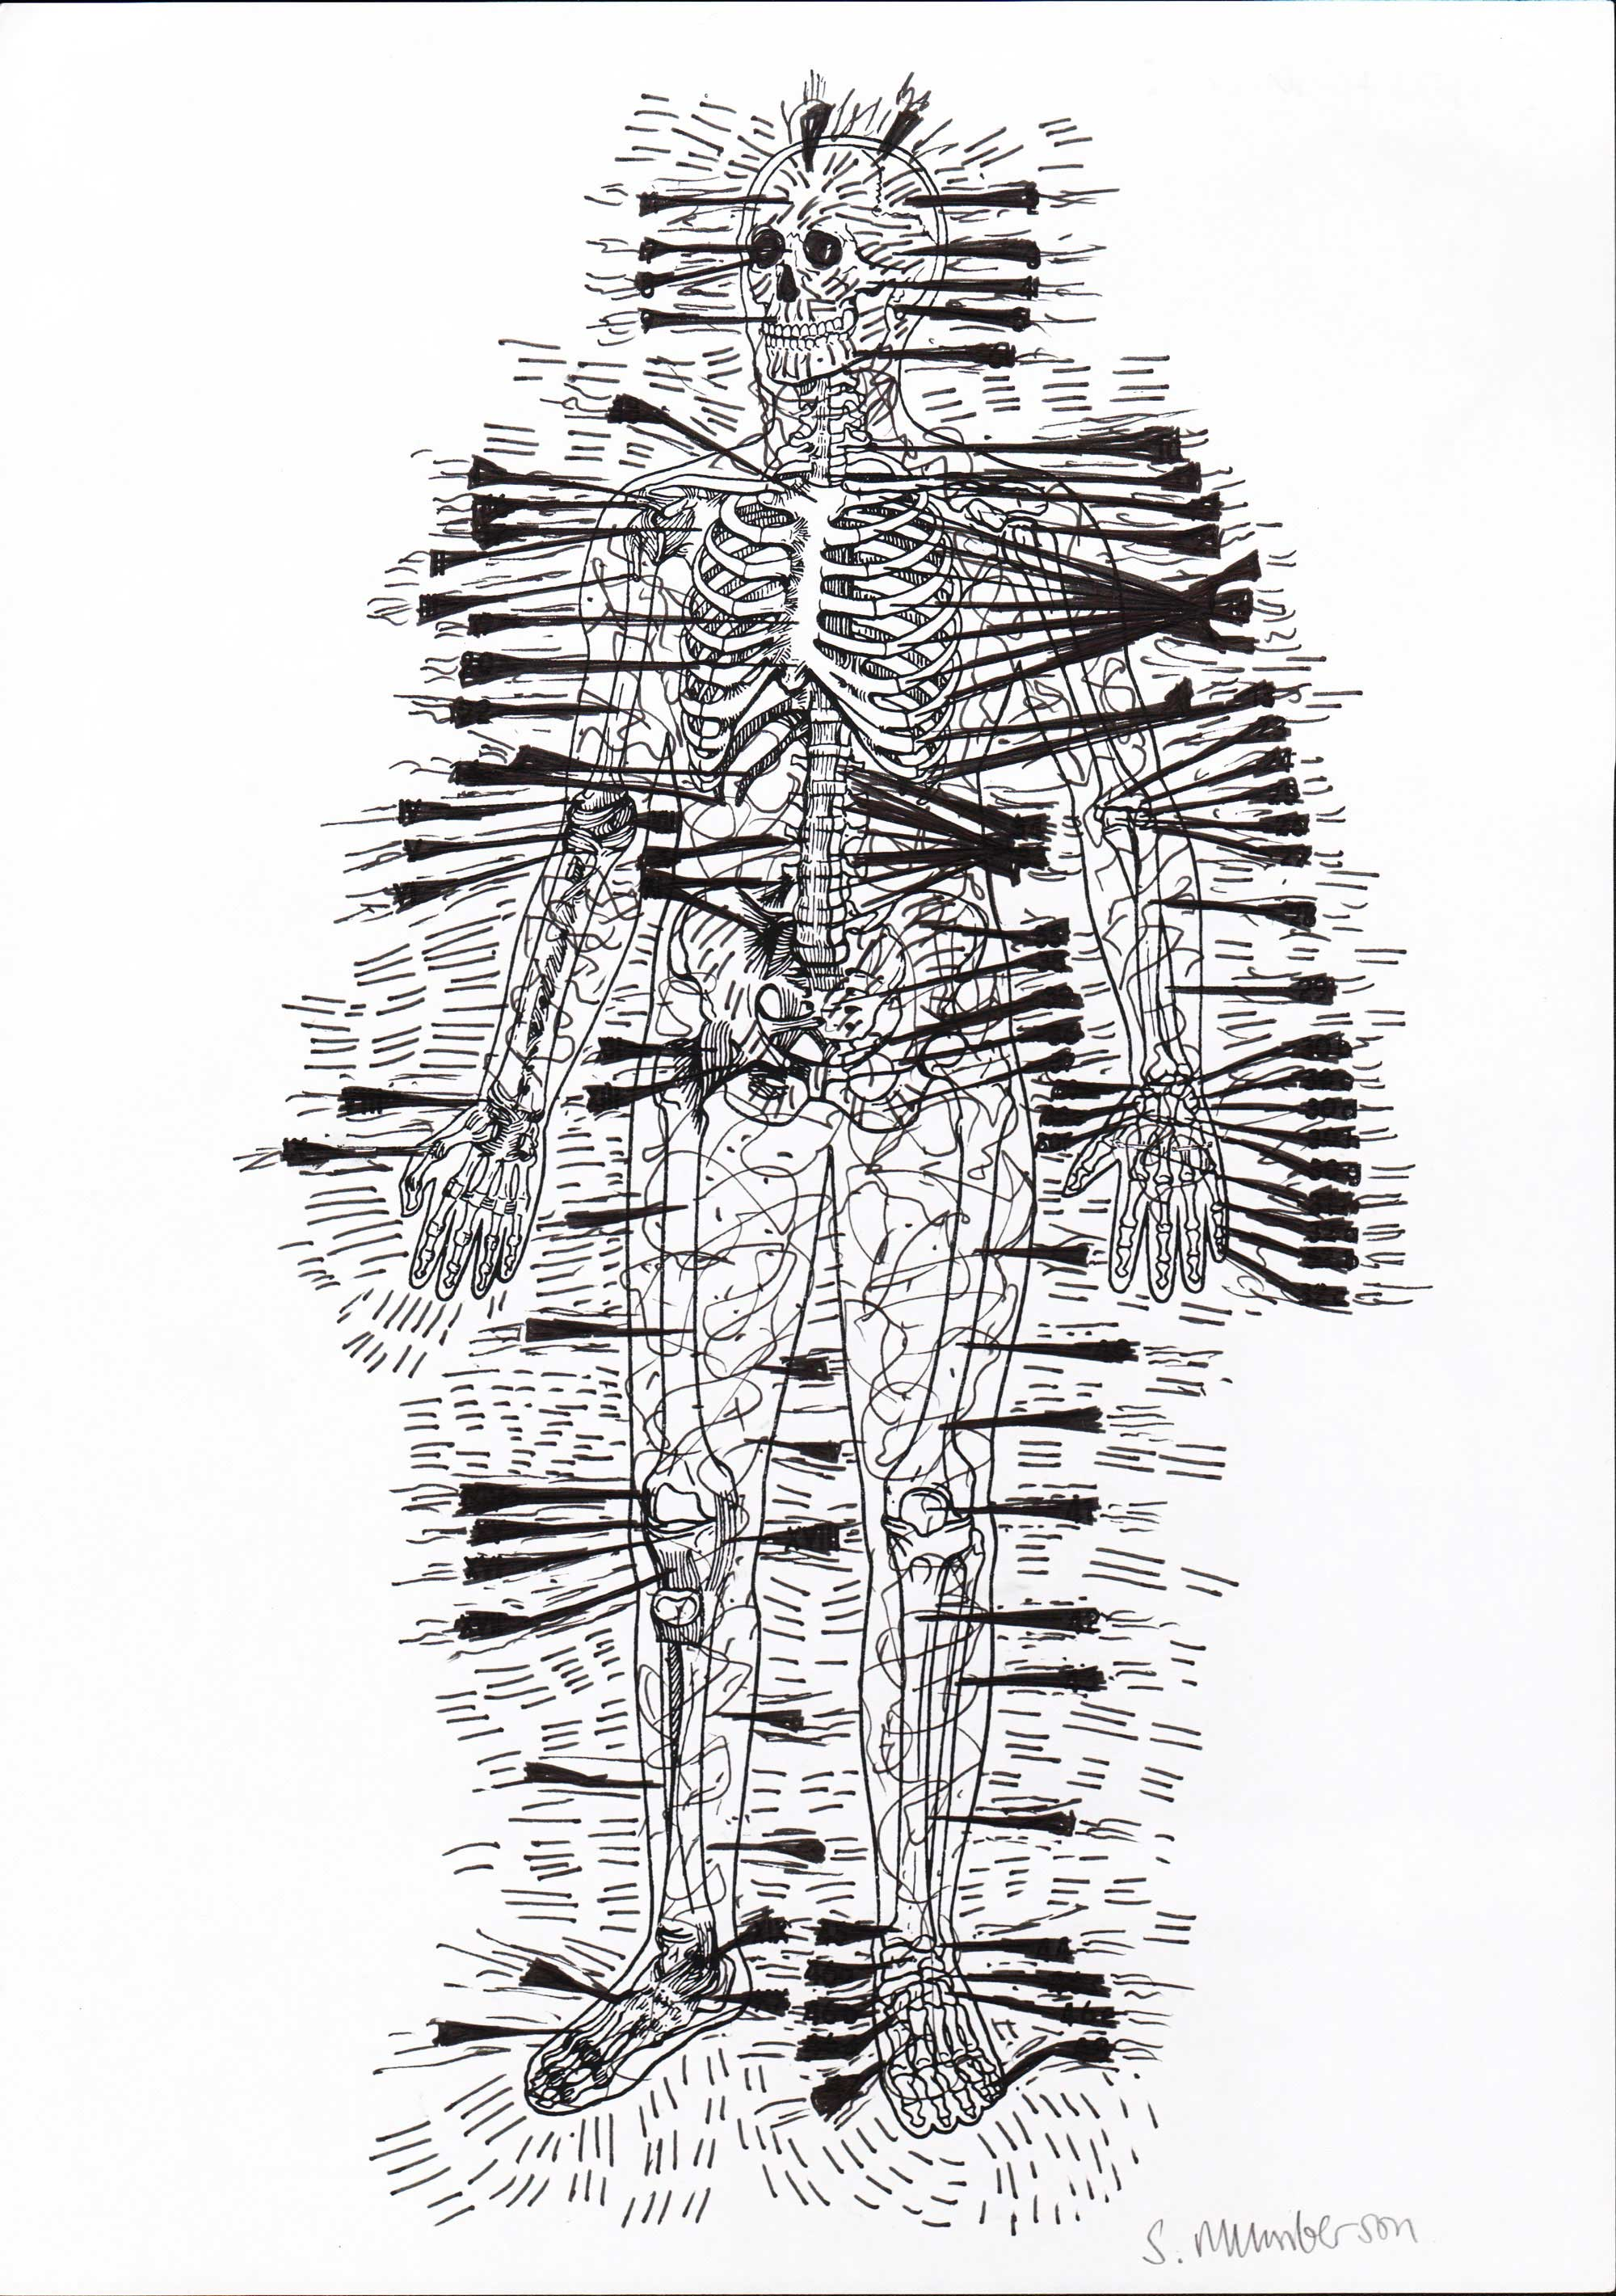 Stephen MUMBERSON (1955) UK, New Human 2, 2015, Pen, 20,5 x 21 cm